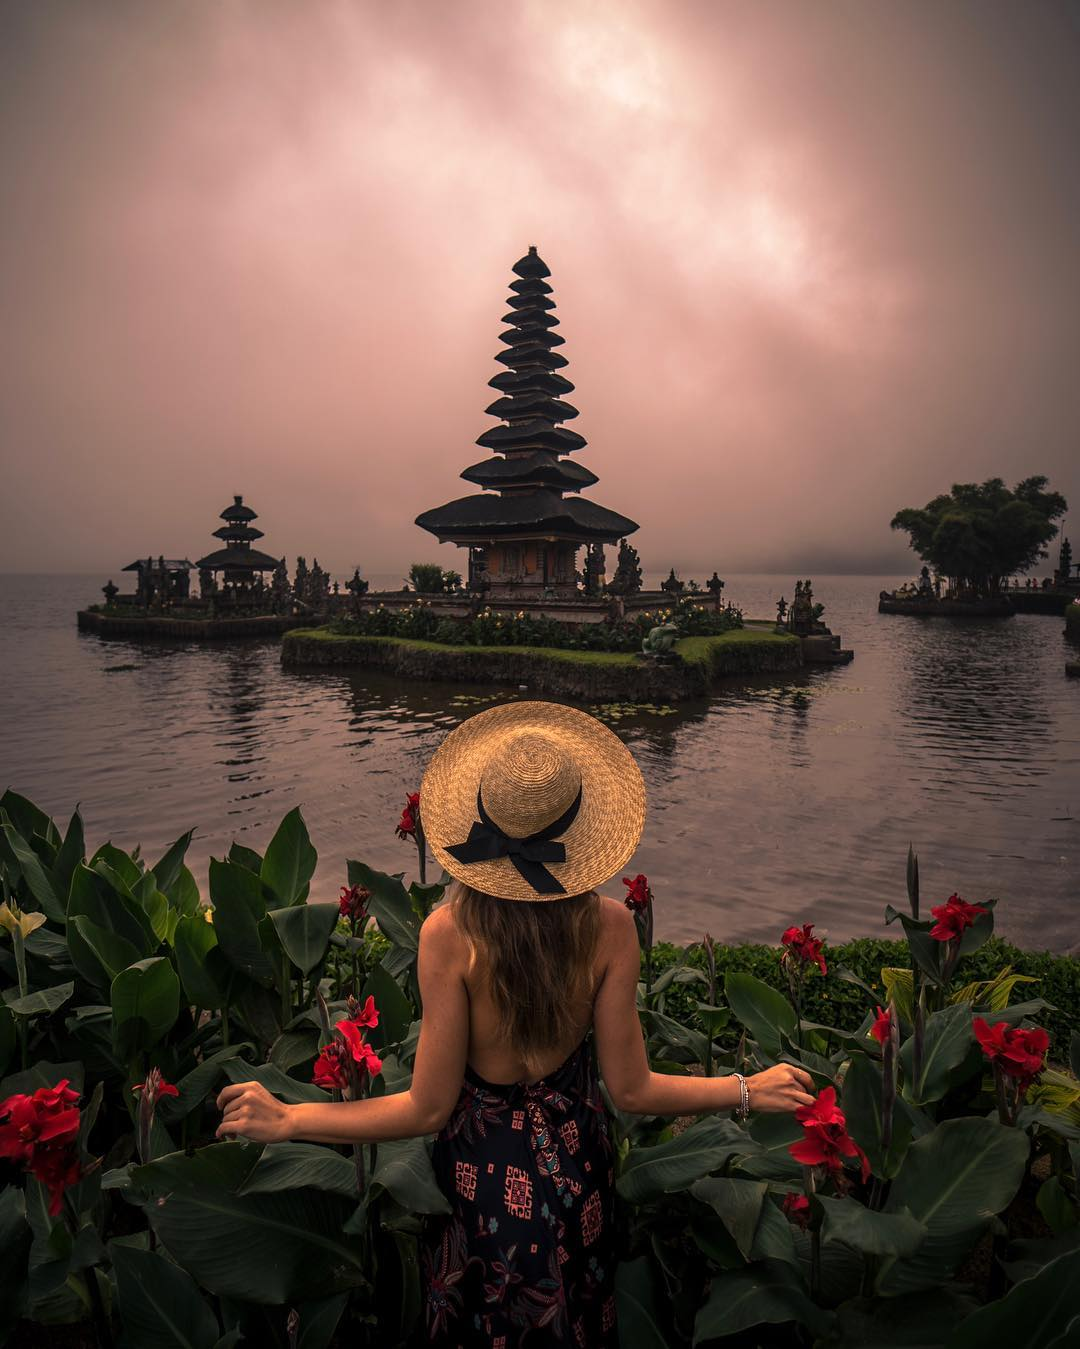 Temples in Bali; Pura Ulun Danu Beratan